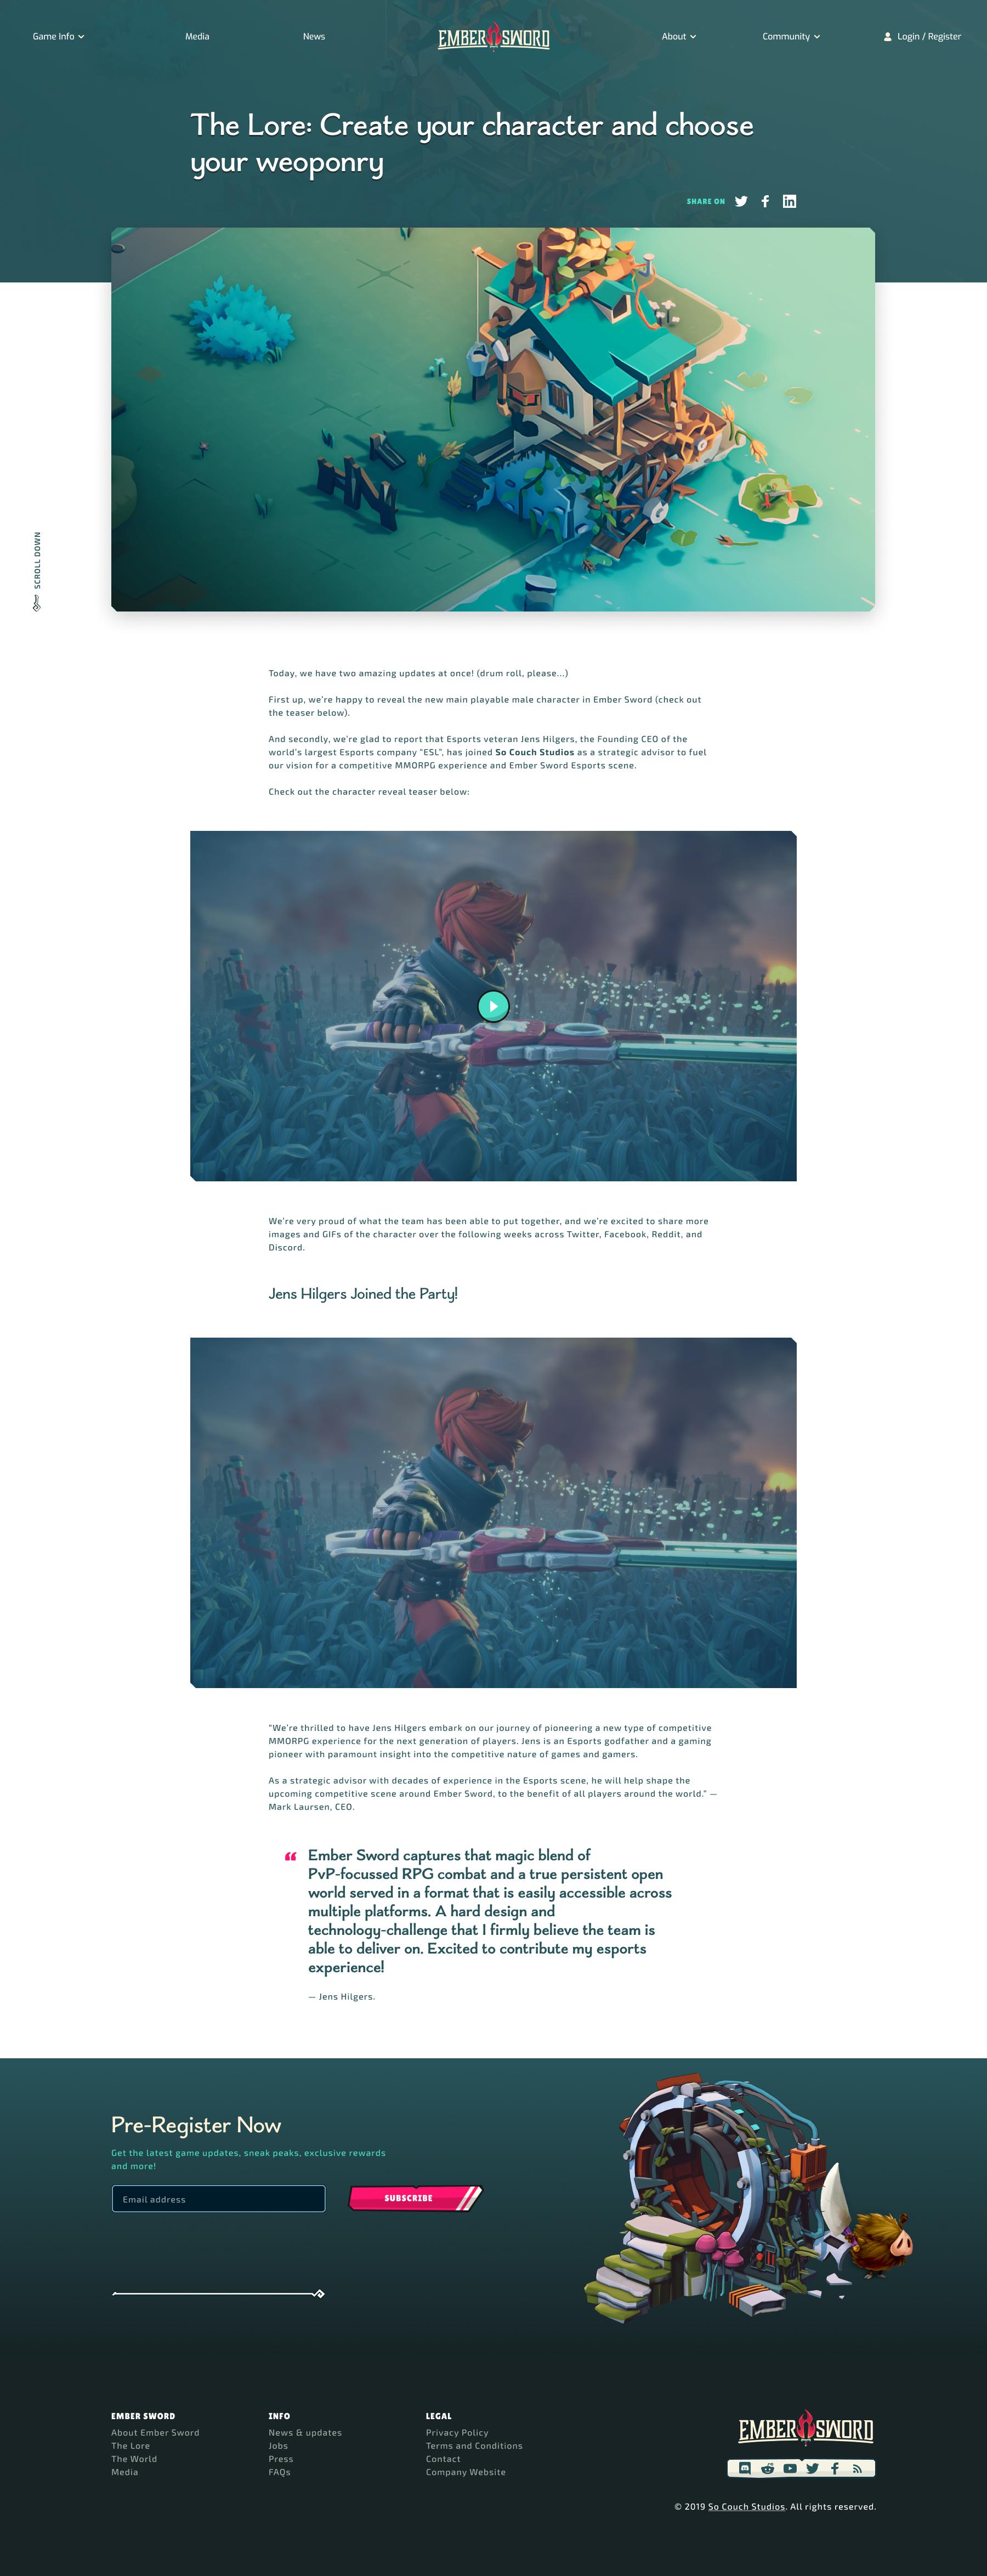 Ember Sword - Game info detail page design